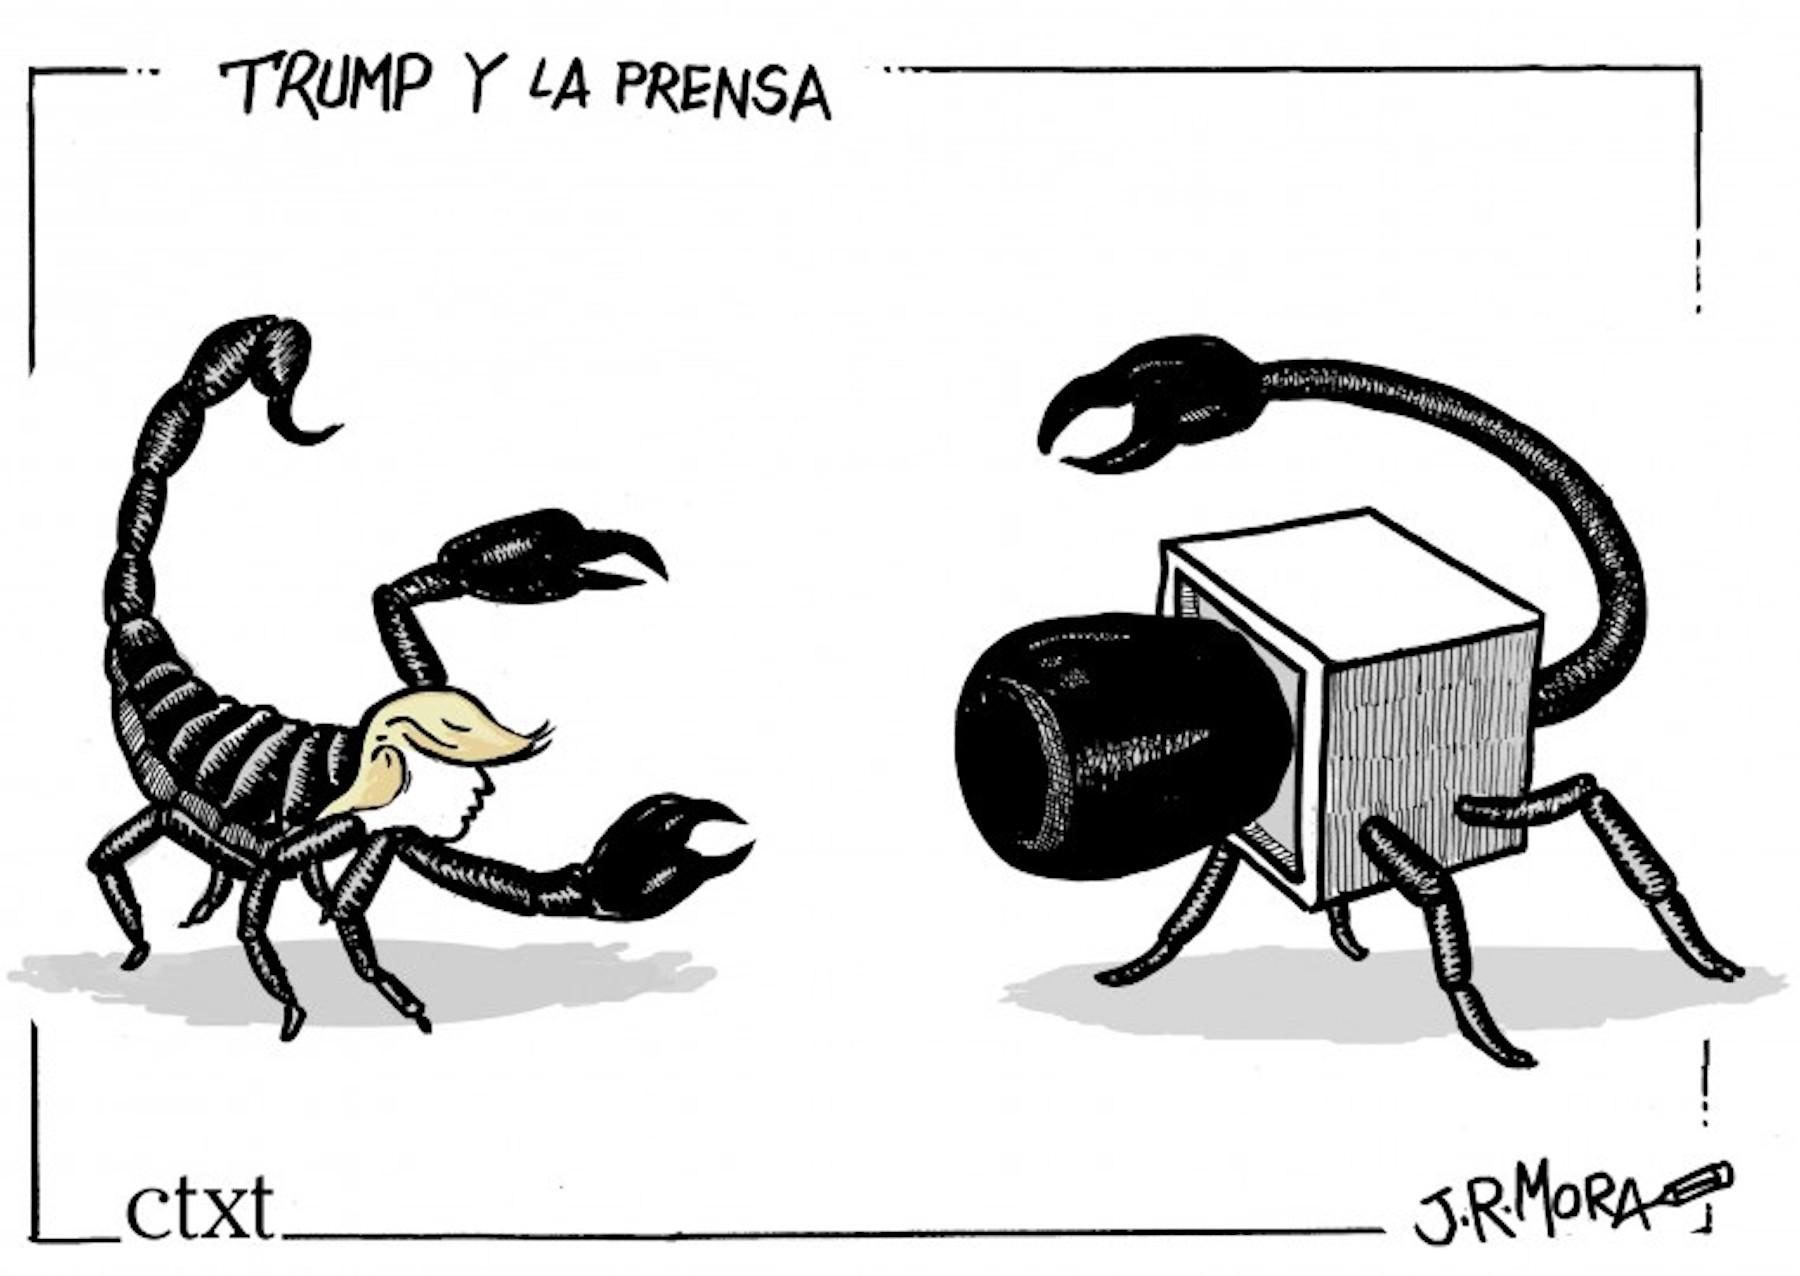 <p><em>Trump y la prensa.</em></p>